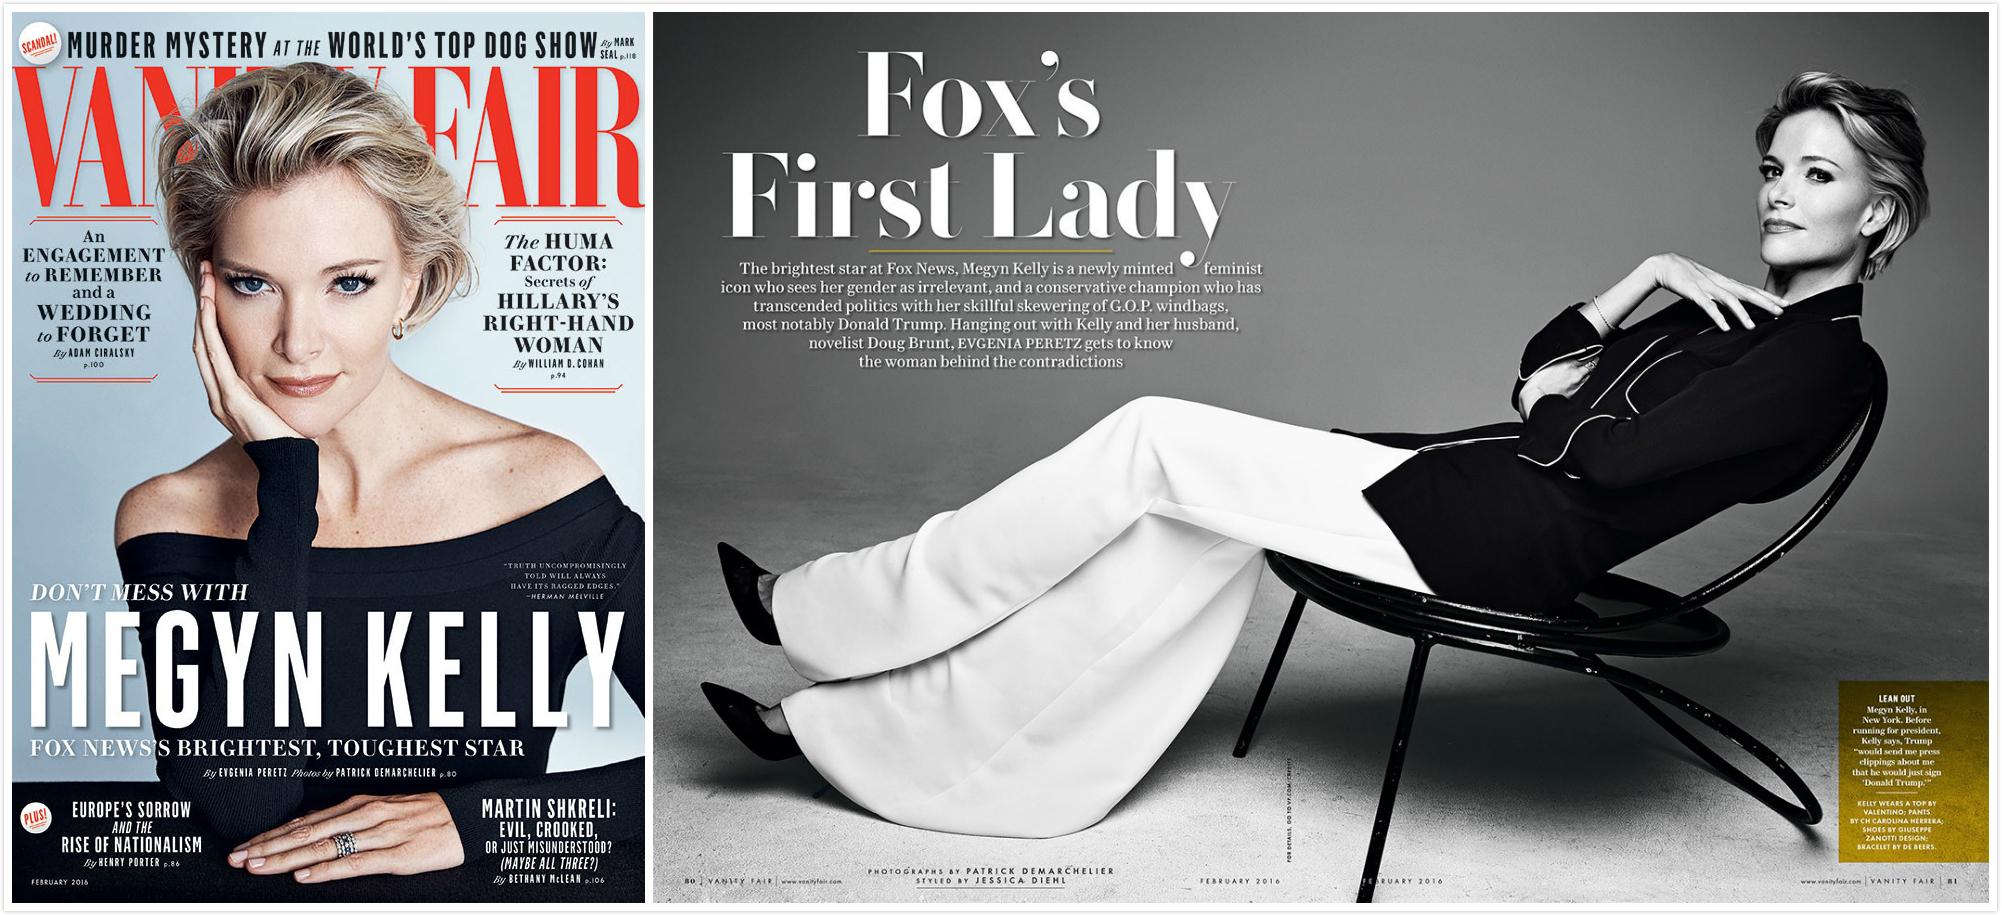 FOX花旦跳槽震动美国传媒圈 年薪或超$2000万